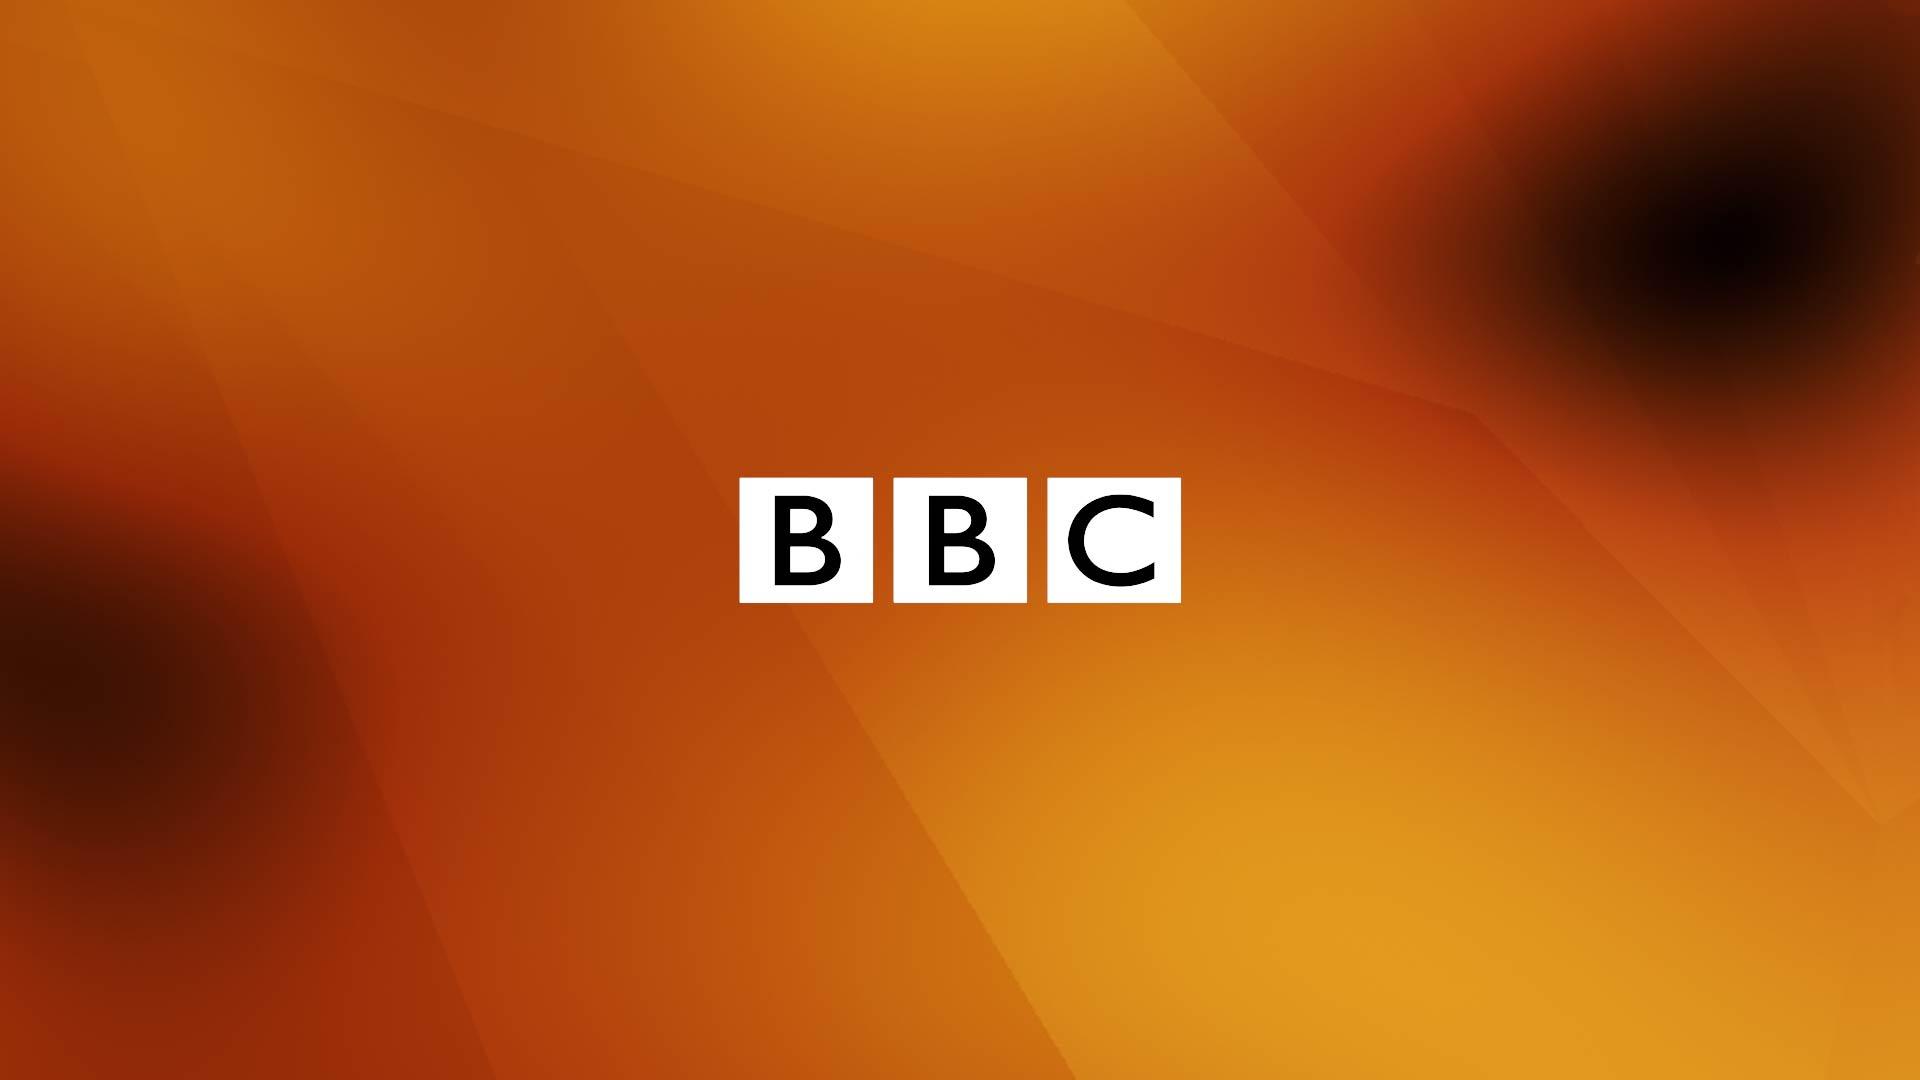 BBC_04.jpg